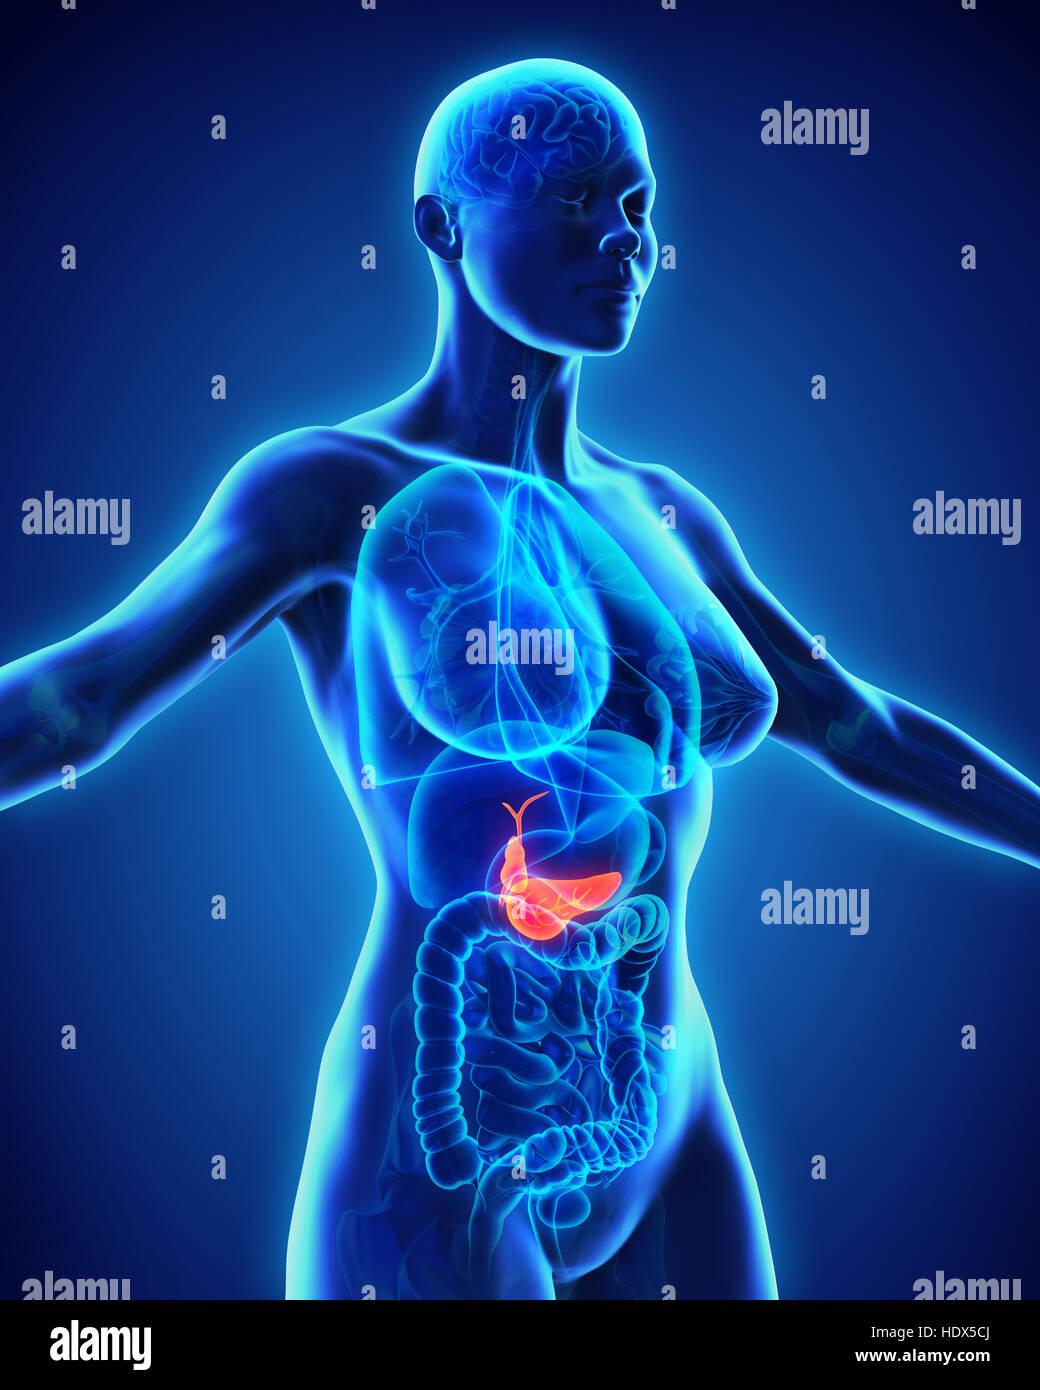 Human Gallbladder and Pancreas Anatomy Stock Photo: 129038130 - Alamy